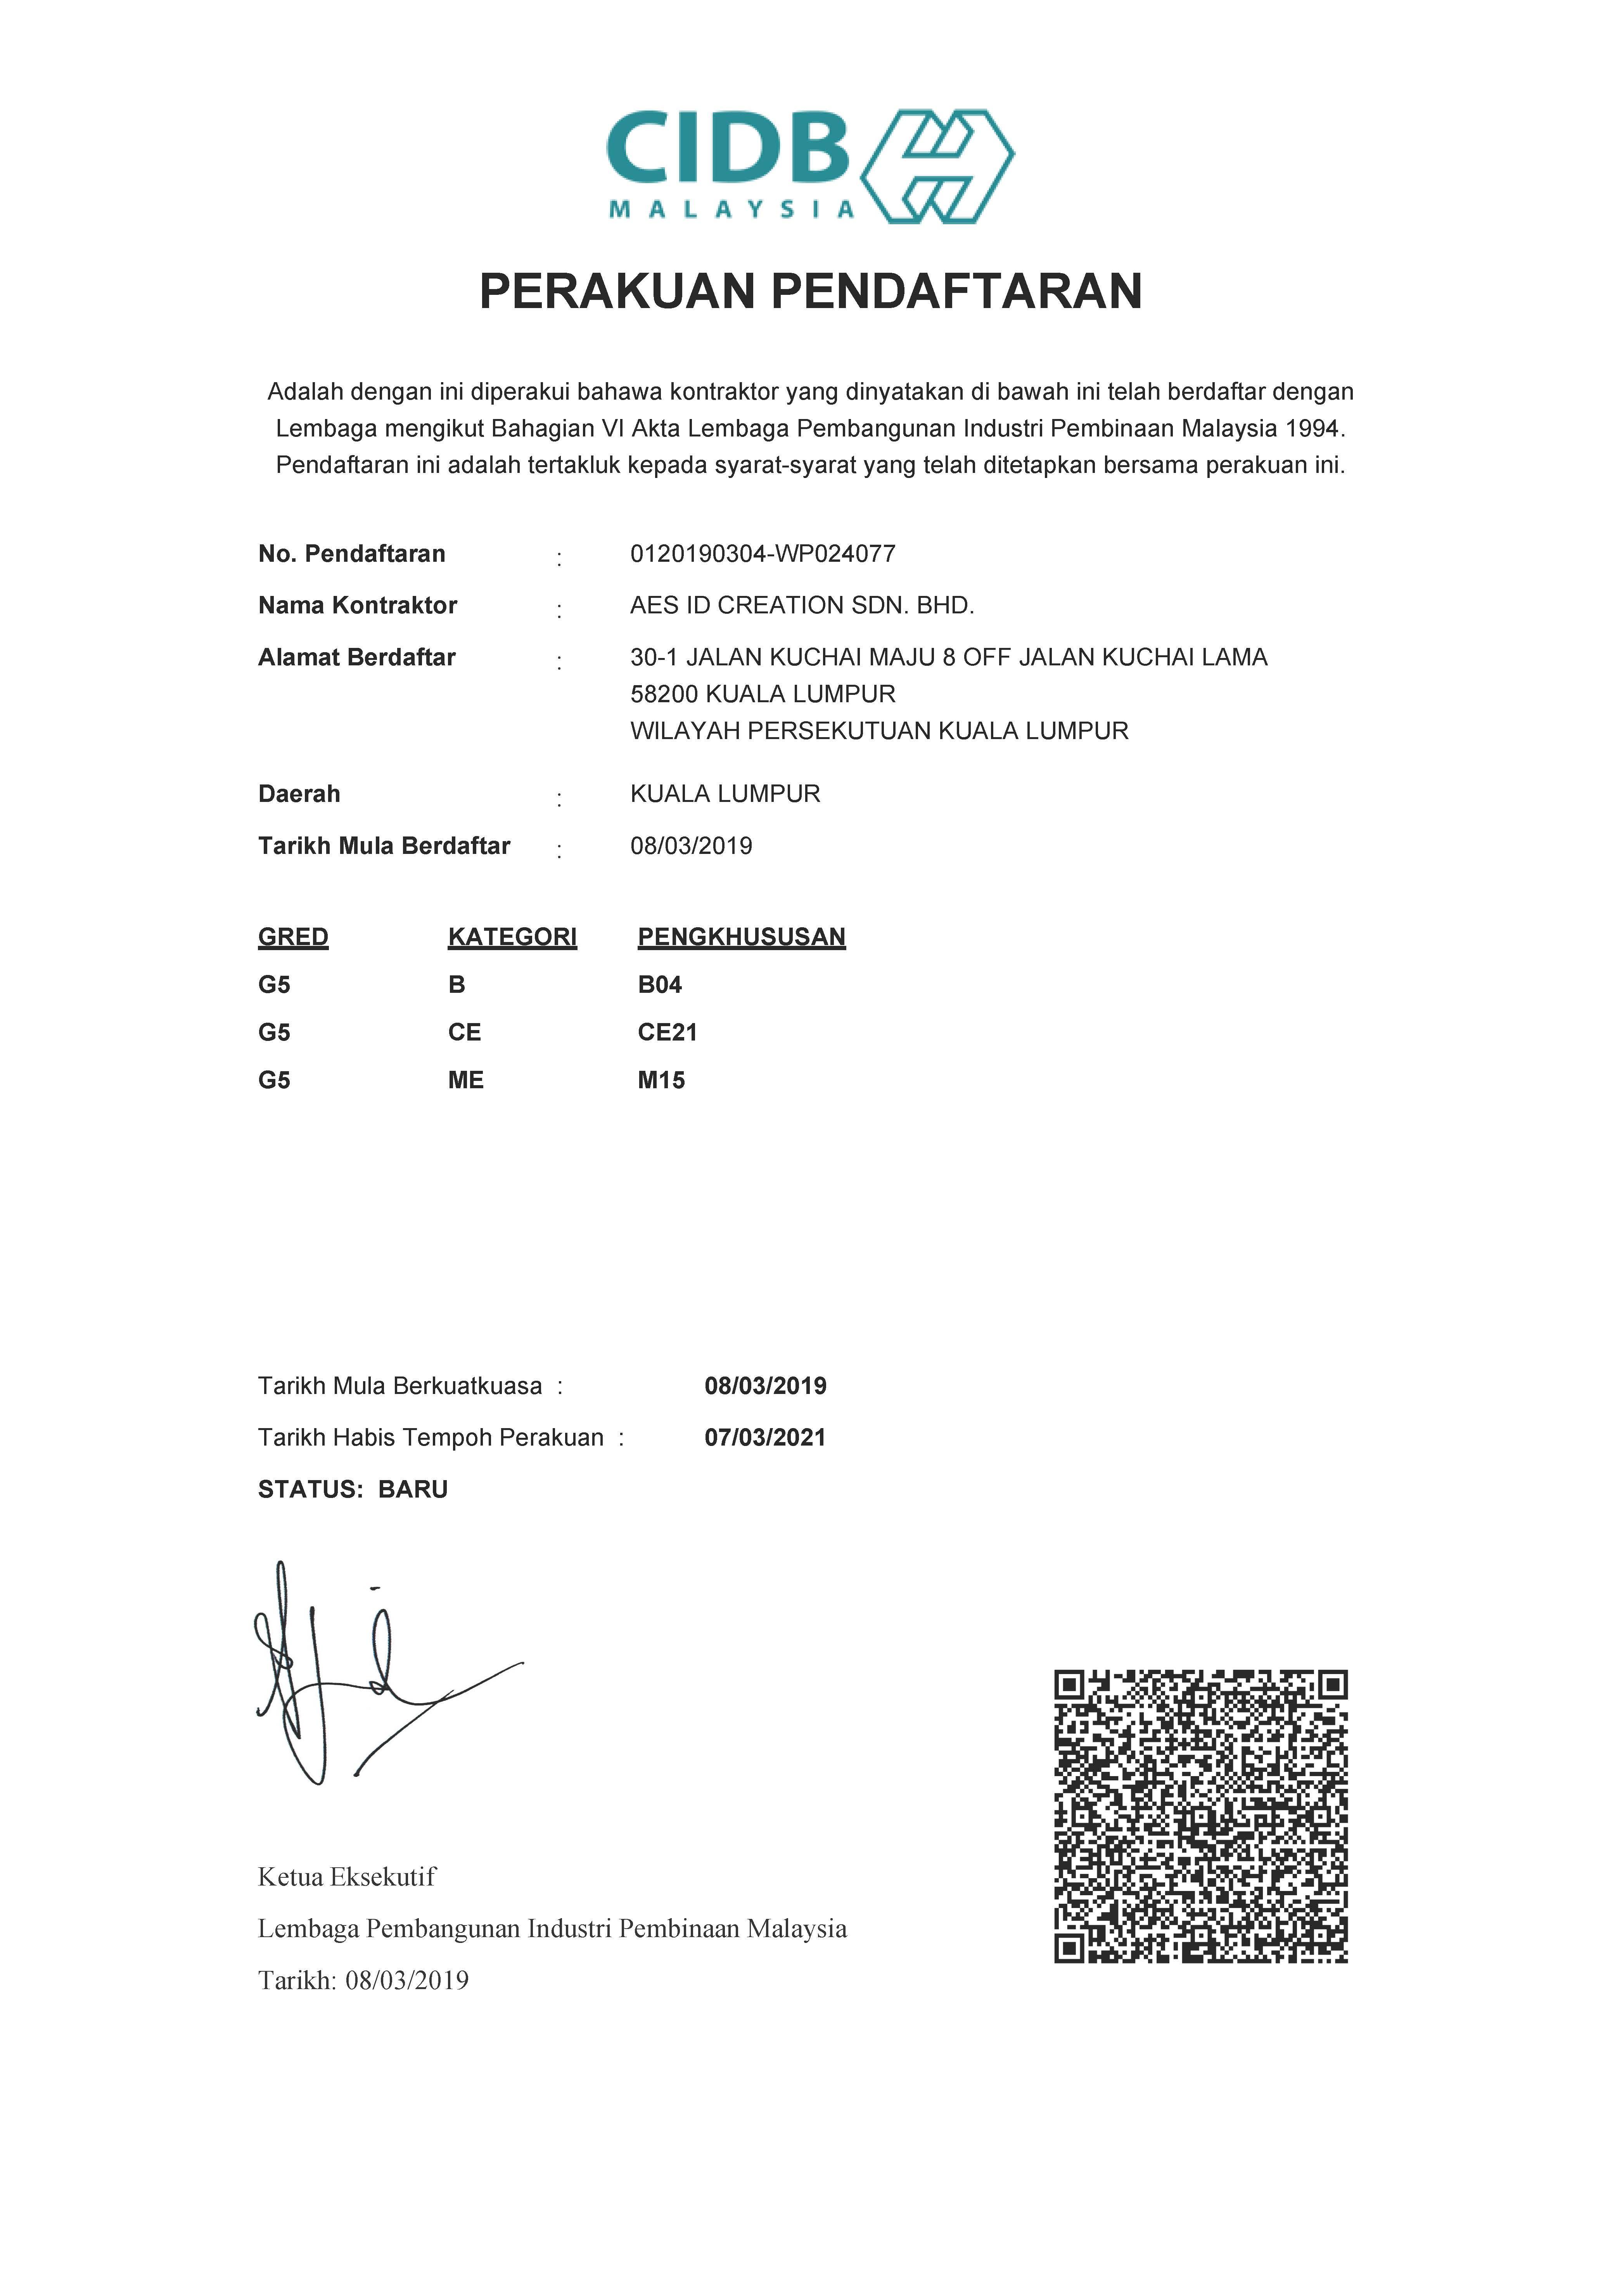 CIDB G5 Certificate